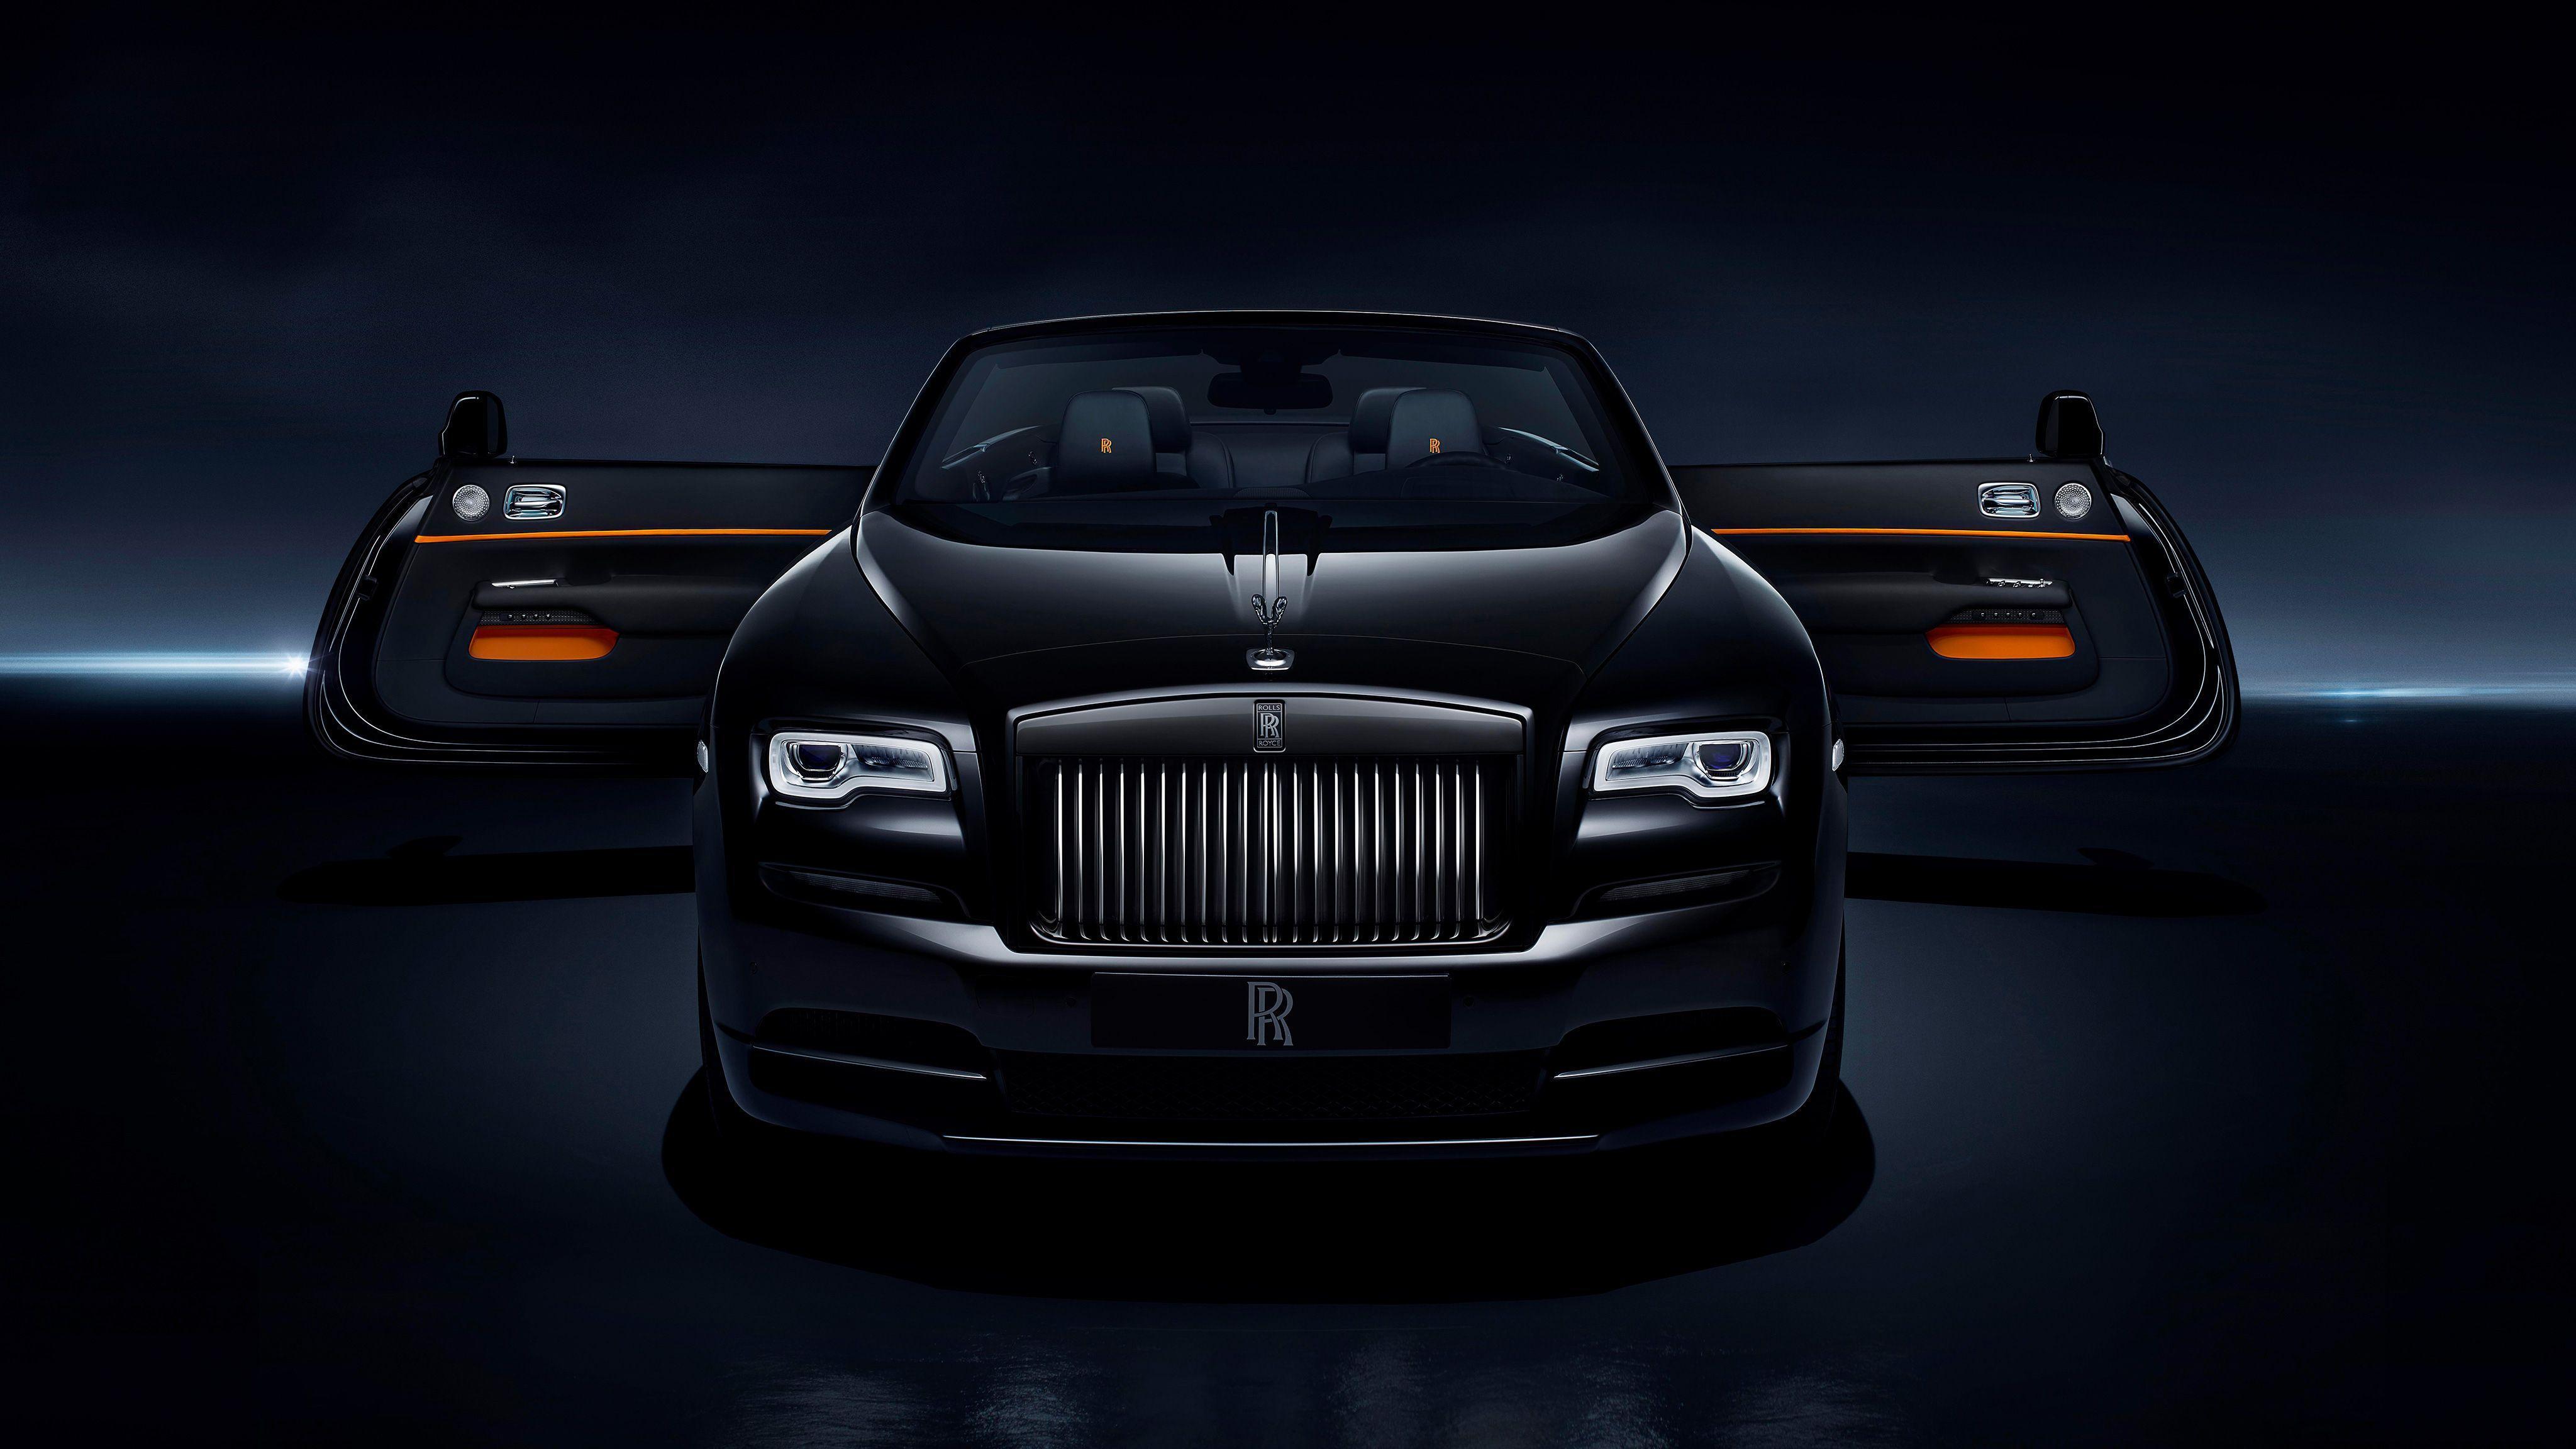 Rolls Royce Hd Wallpapers Wallpaper Cave